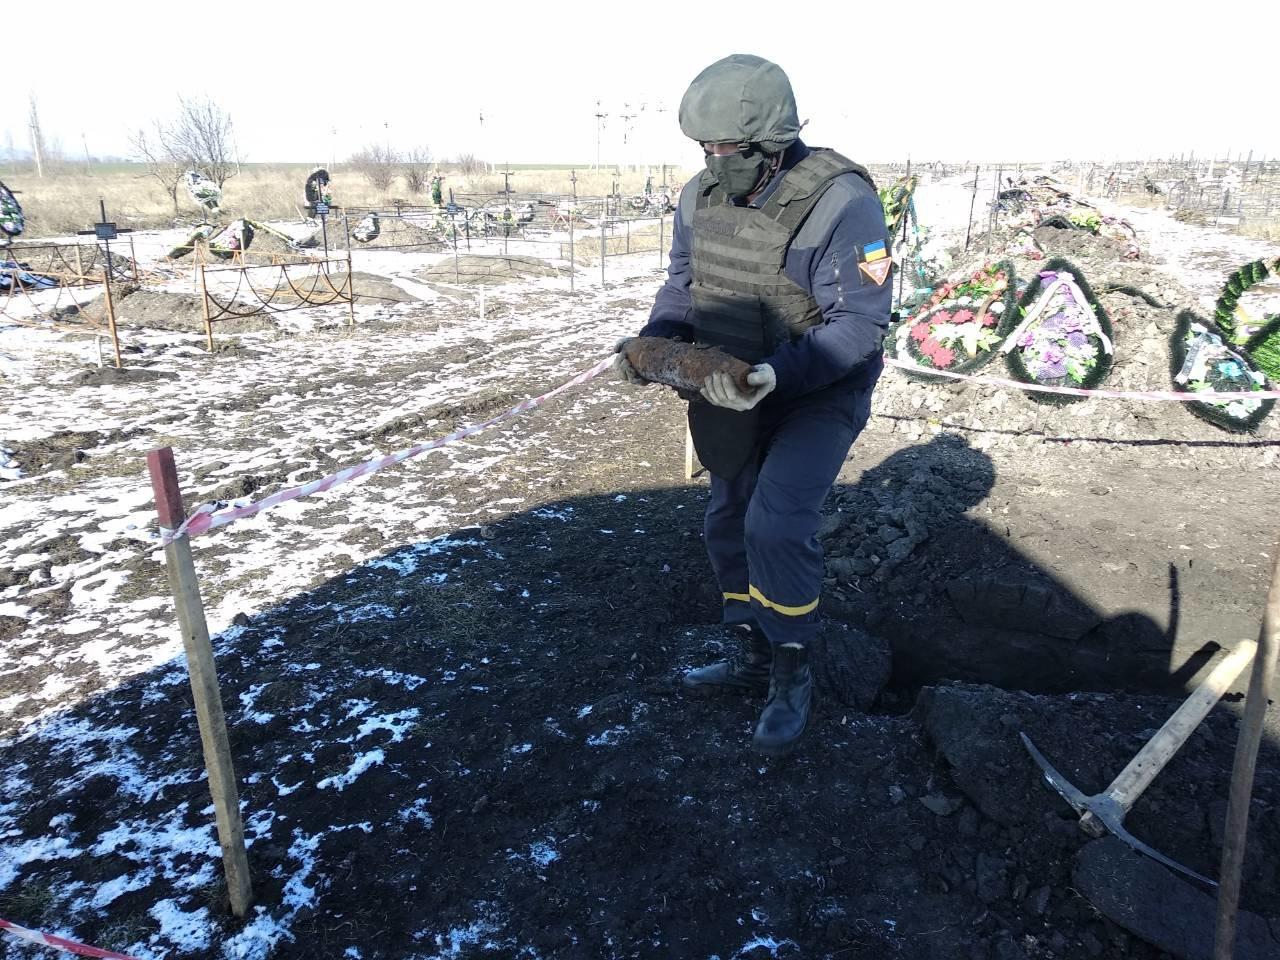 В Одесской области на кладбище нашли артснаряд, - ФОТО, фото-44